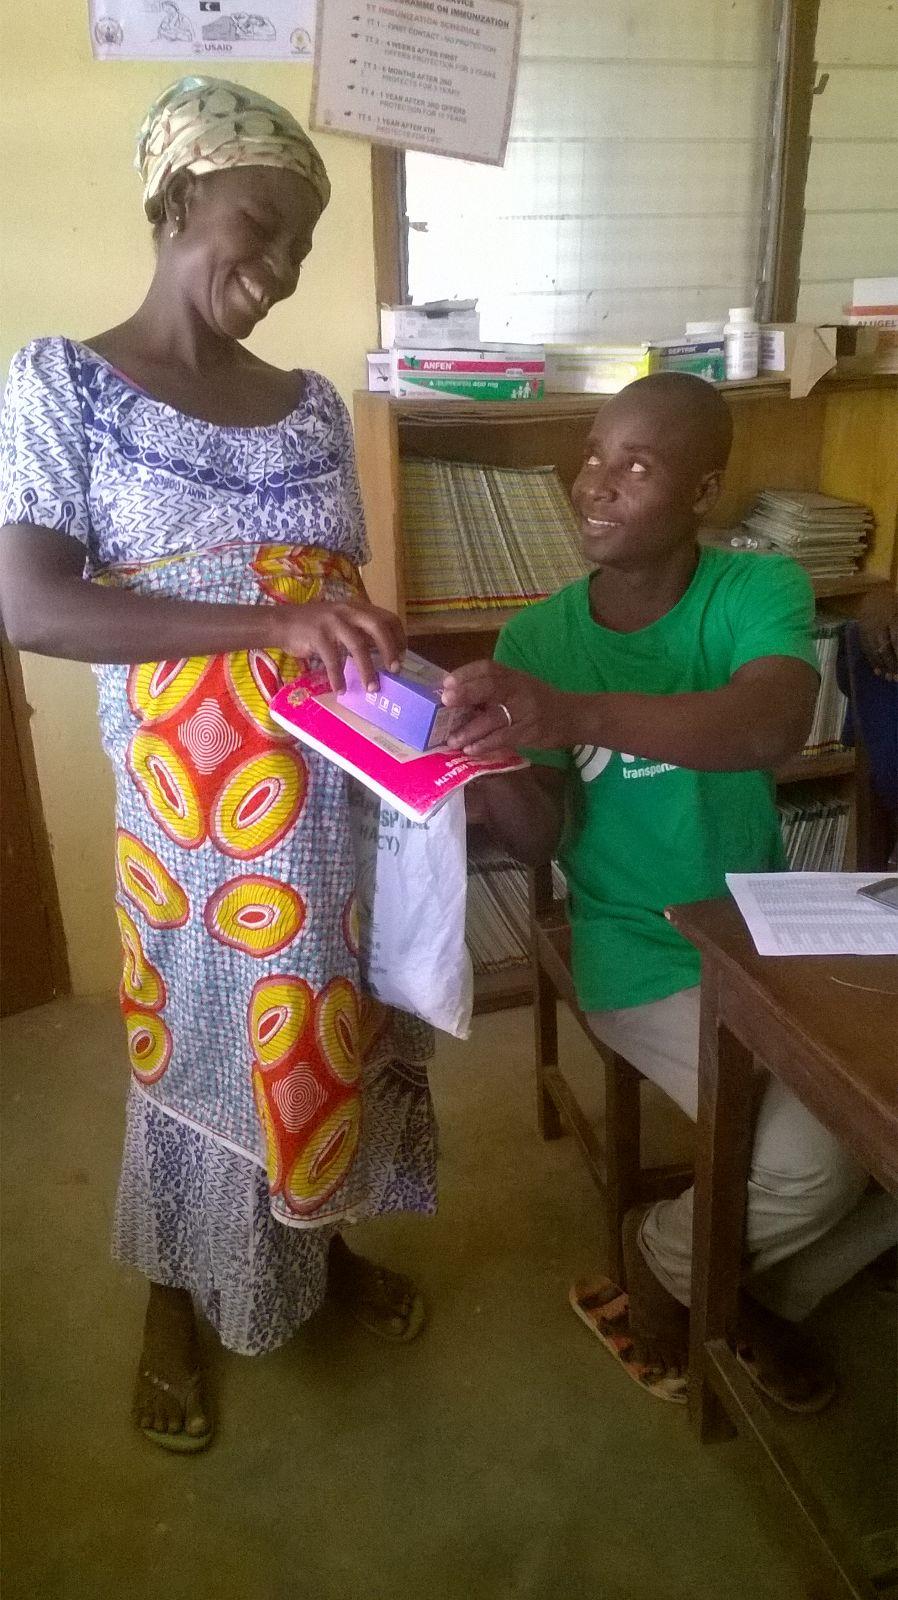 MAZA driver-Ubabe-helping to subscribe pregnant women to MAZA's service in Garinkuka